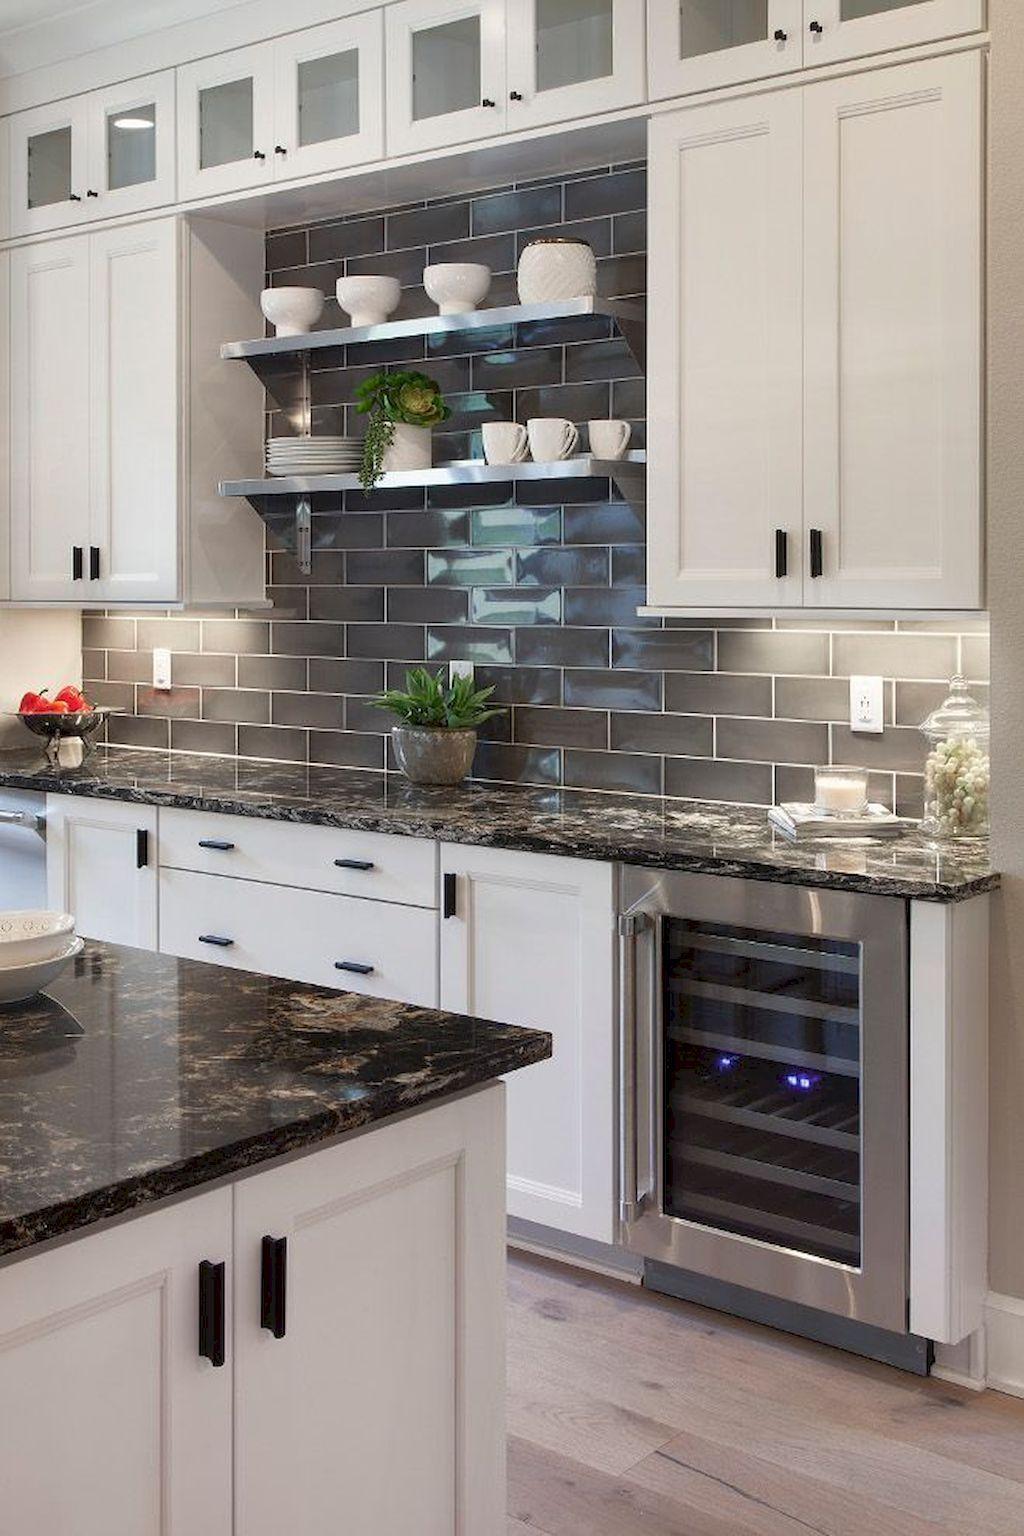 Stunning Glass Backsplash Kitchen Ideas 22